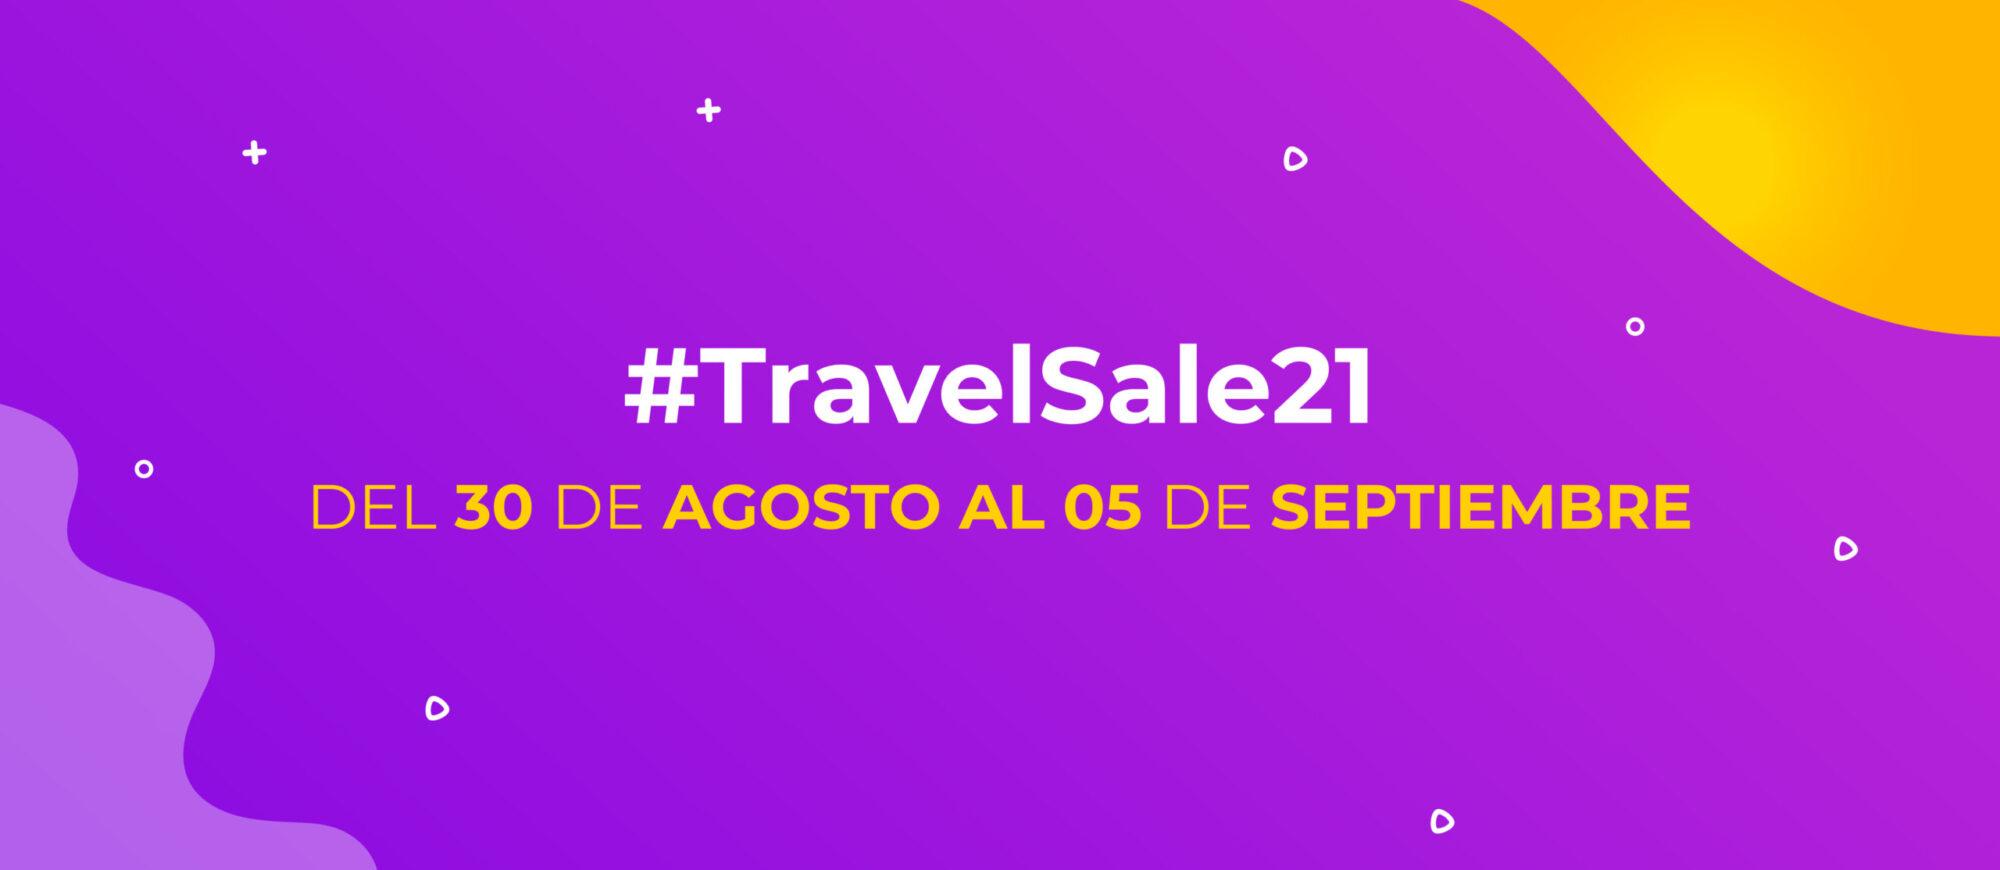 #Travelsale21